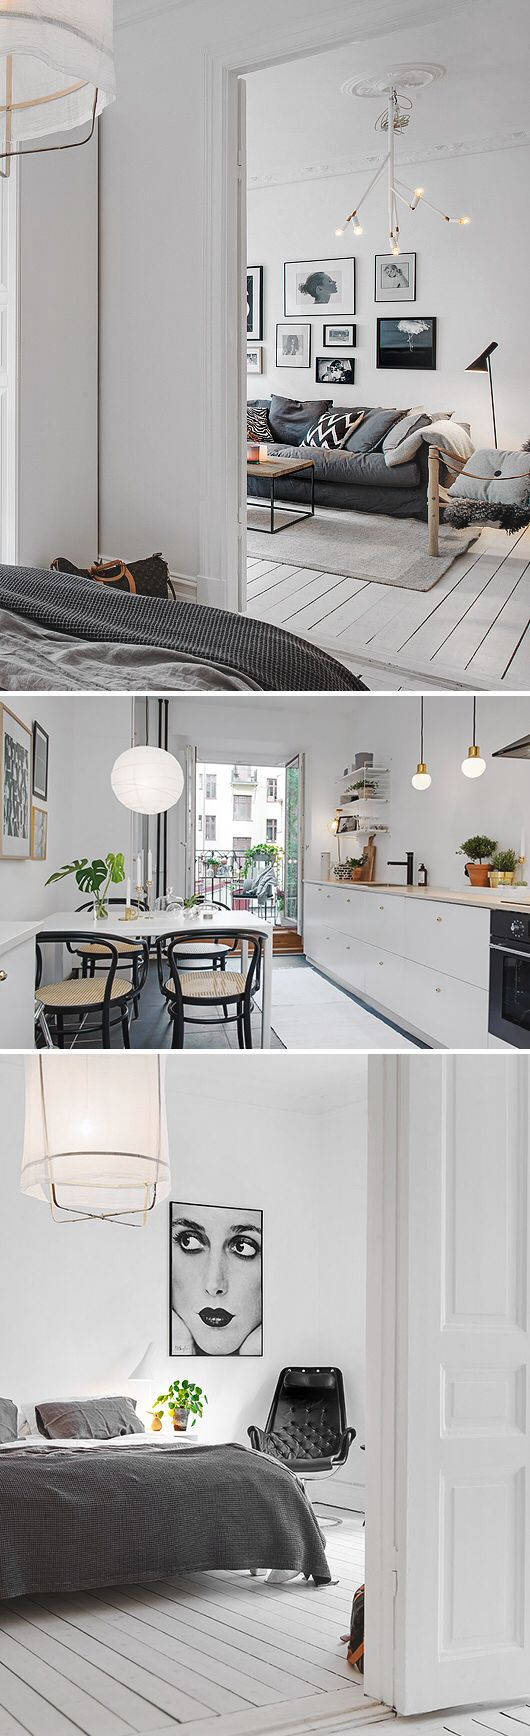 White Monochrome Style Styling Home House Interior Clean Fresh Scandi Basic Decor Trend Design Stylist